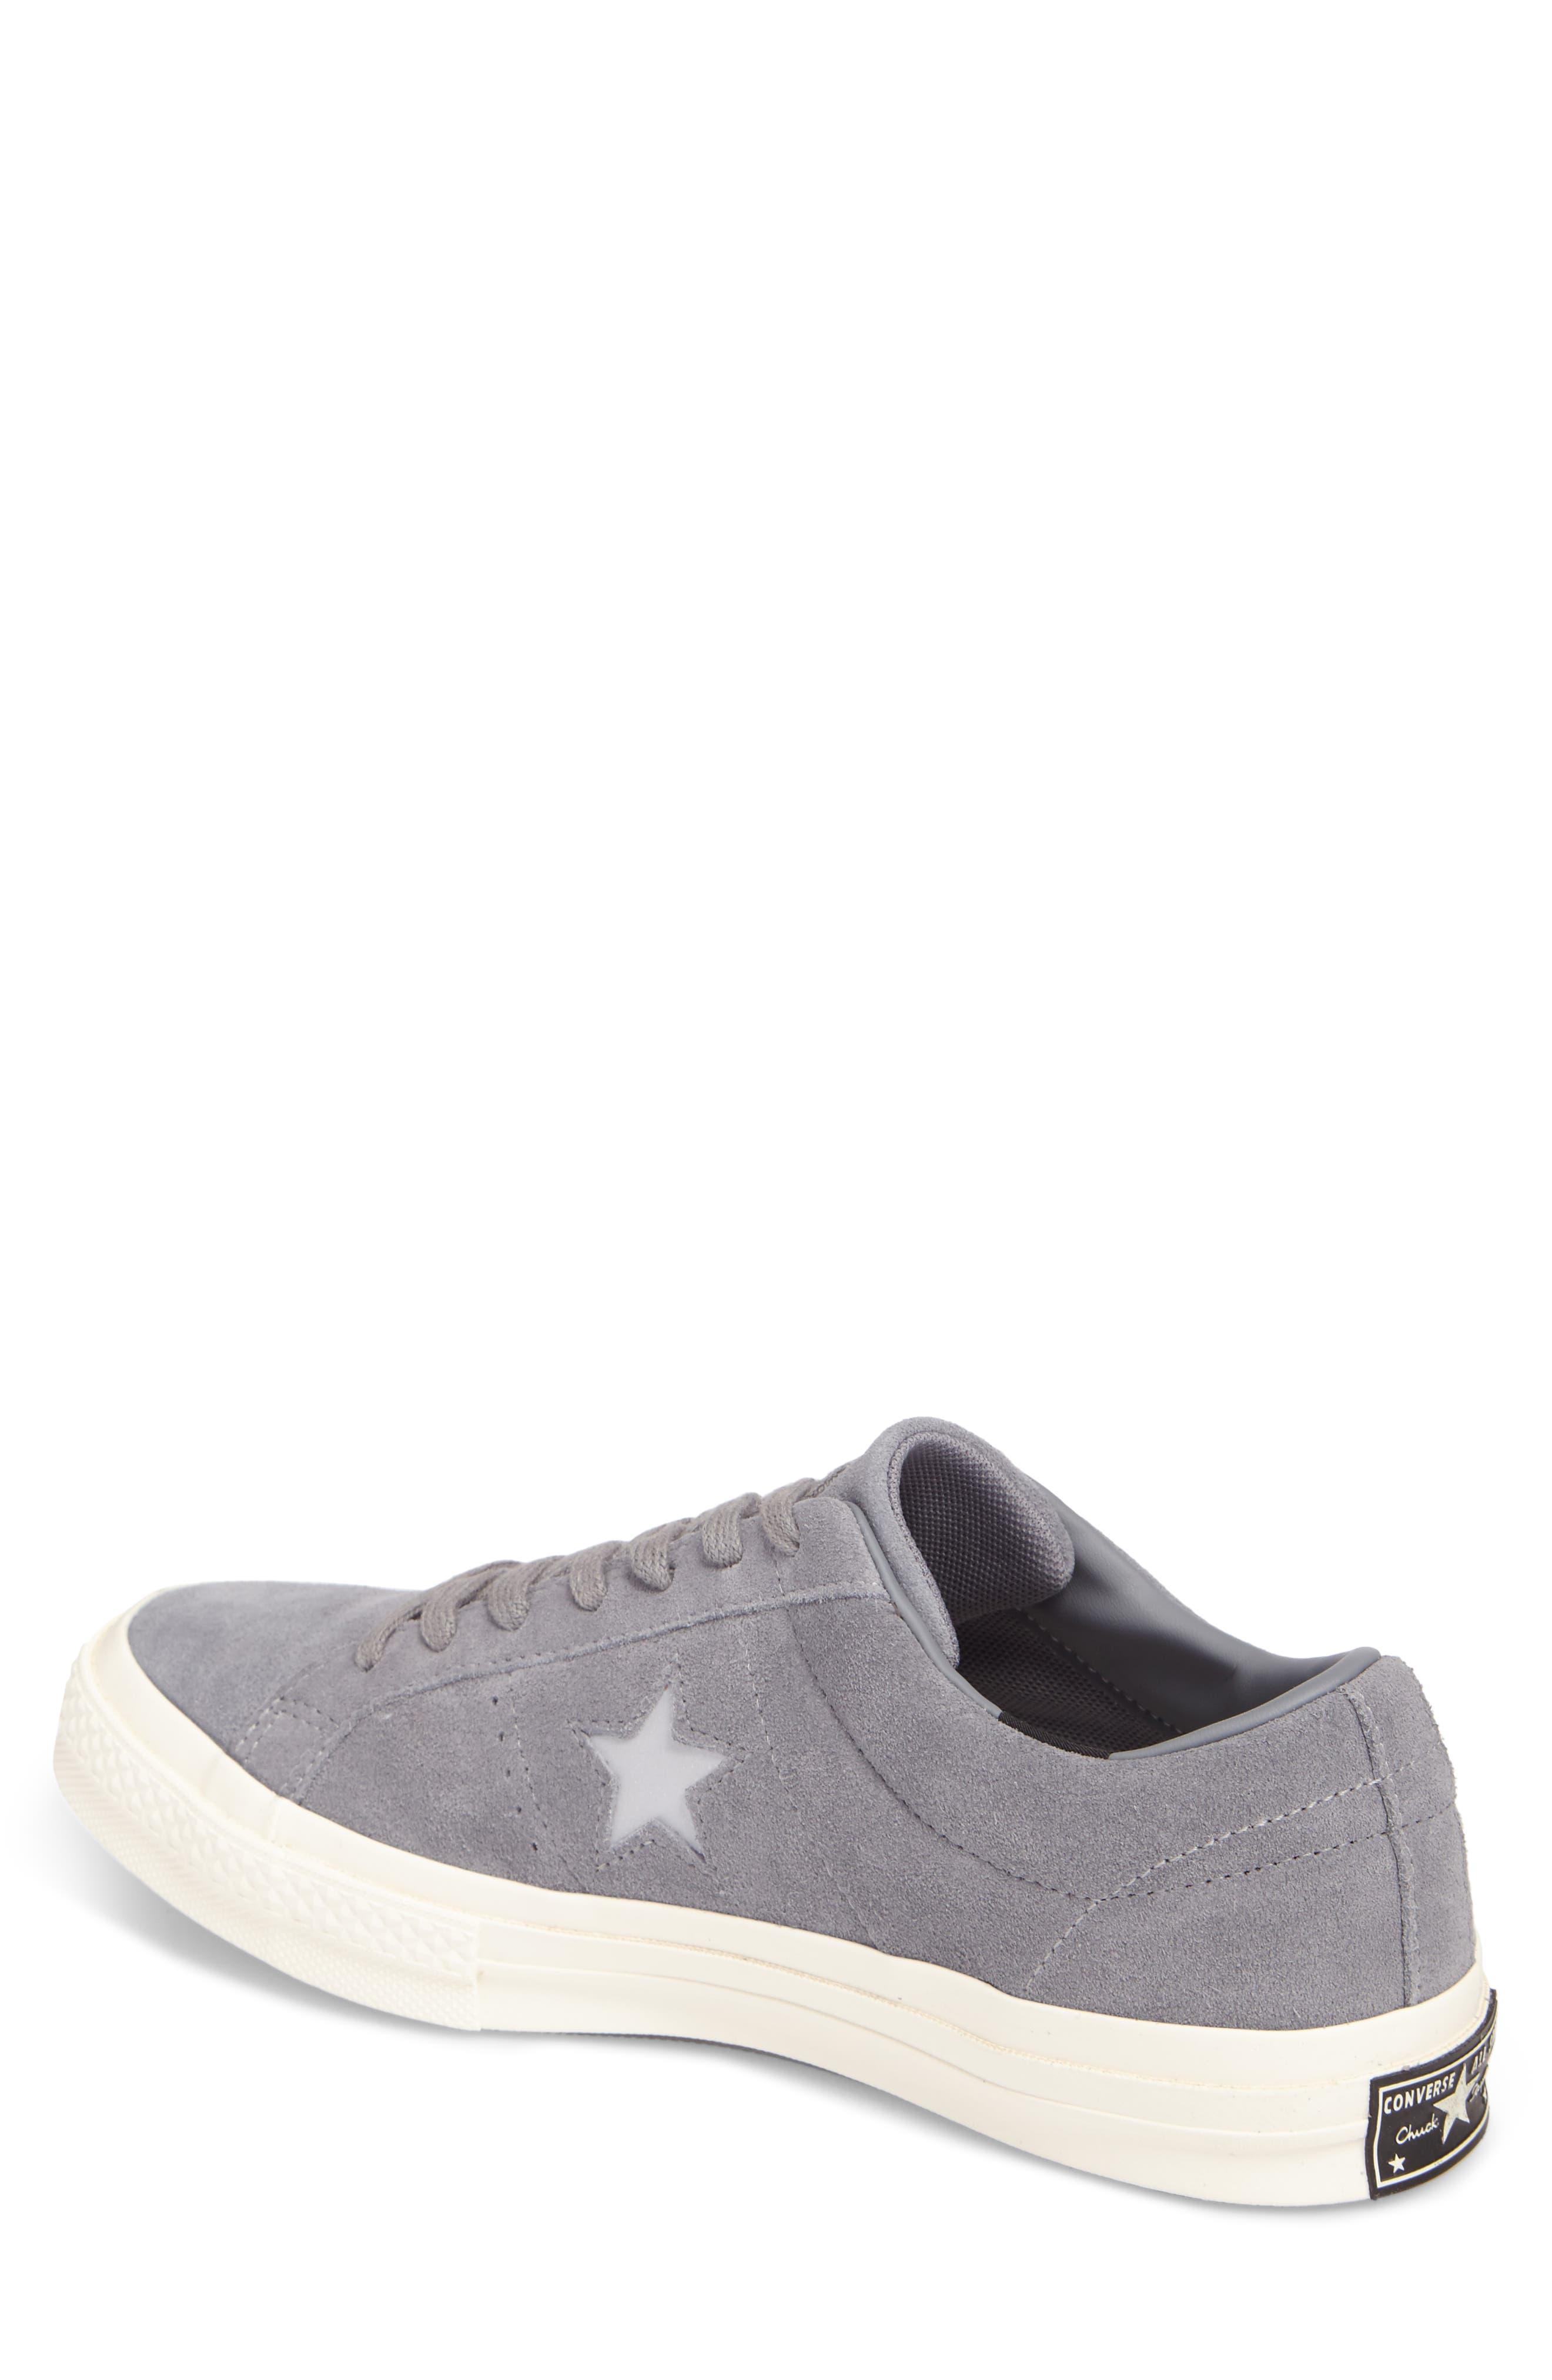 Alternate Image 2  - Converse One Star Sneaker (Men)